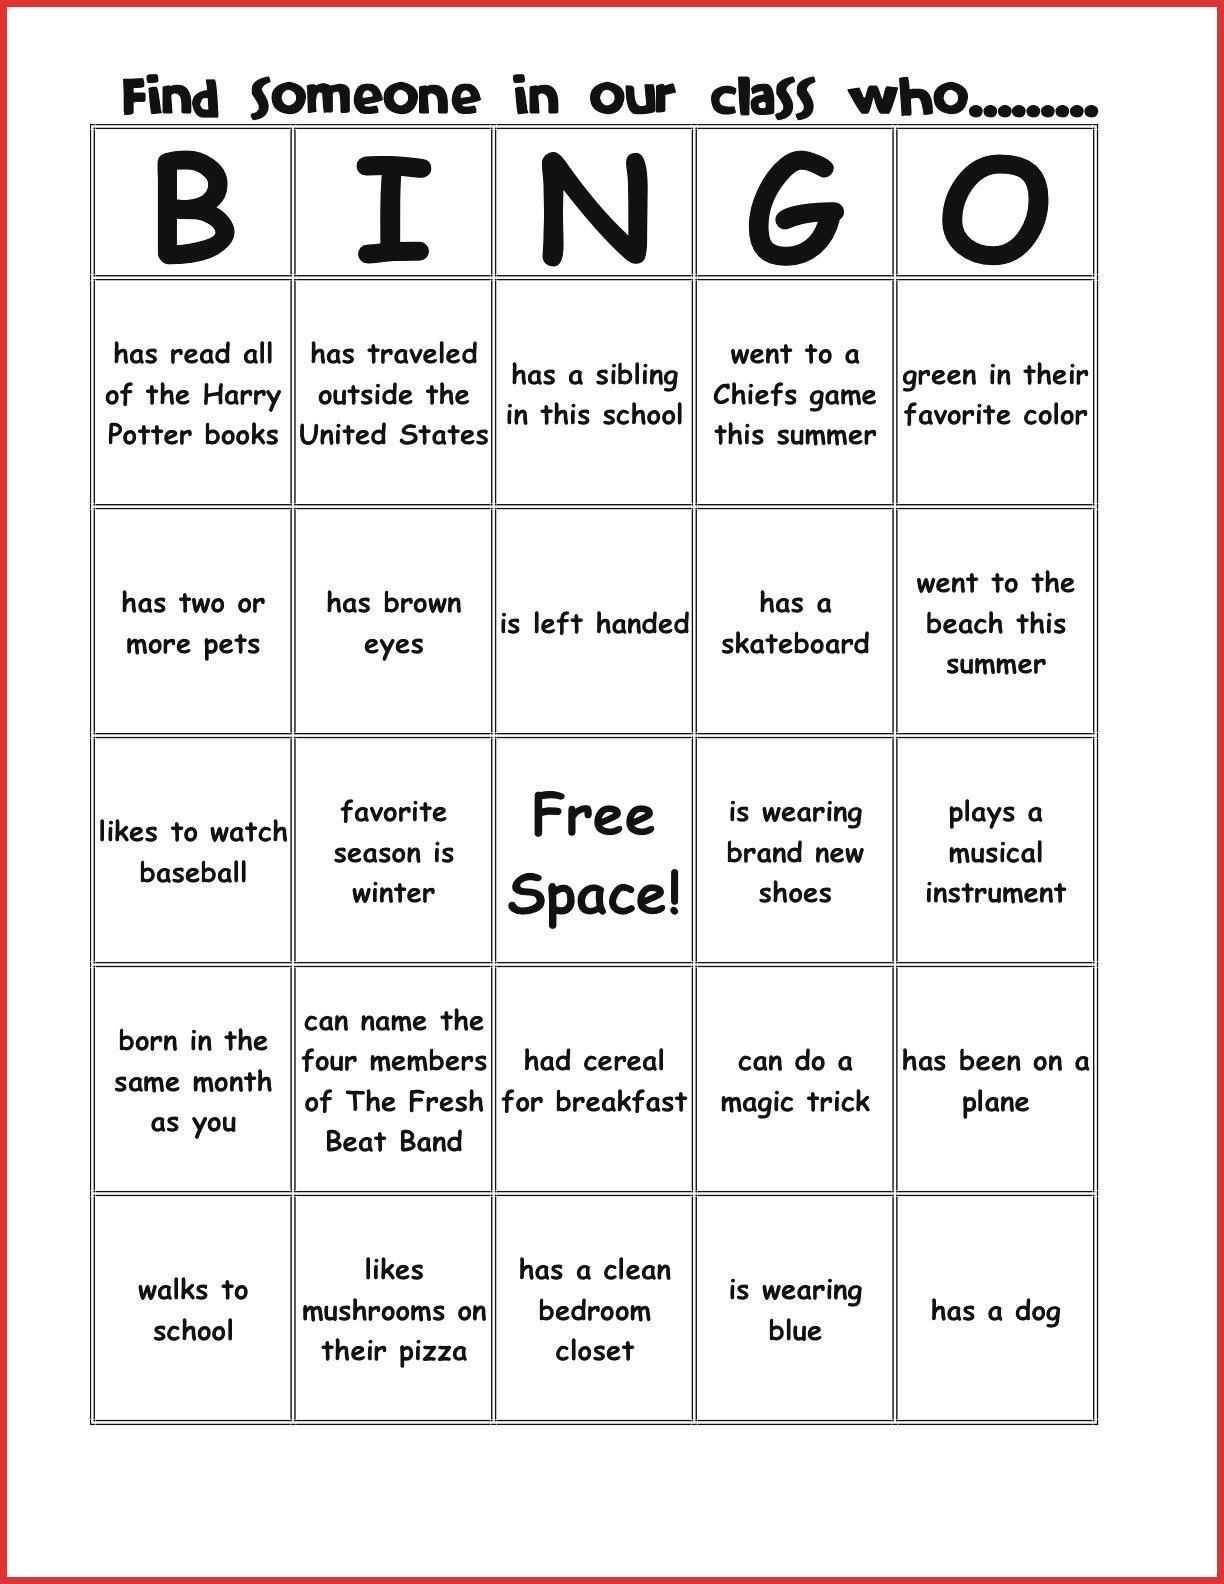 New Bingo Card Template  Leave Latter Intended For Ice Breaker Bingo Card Template